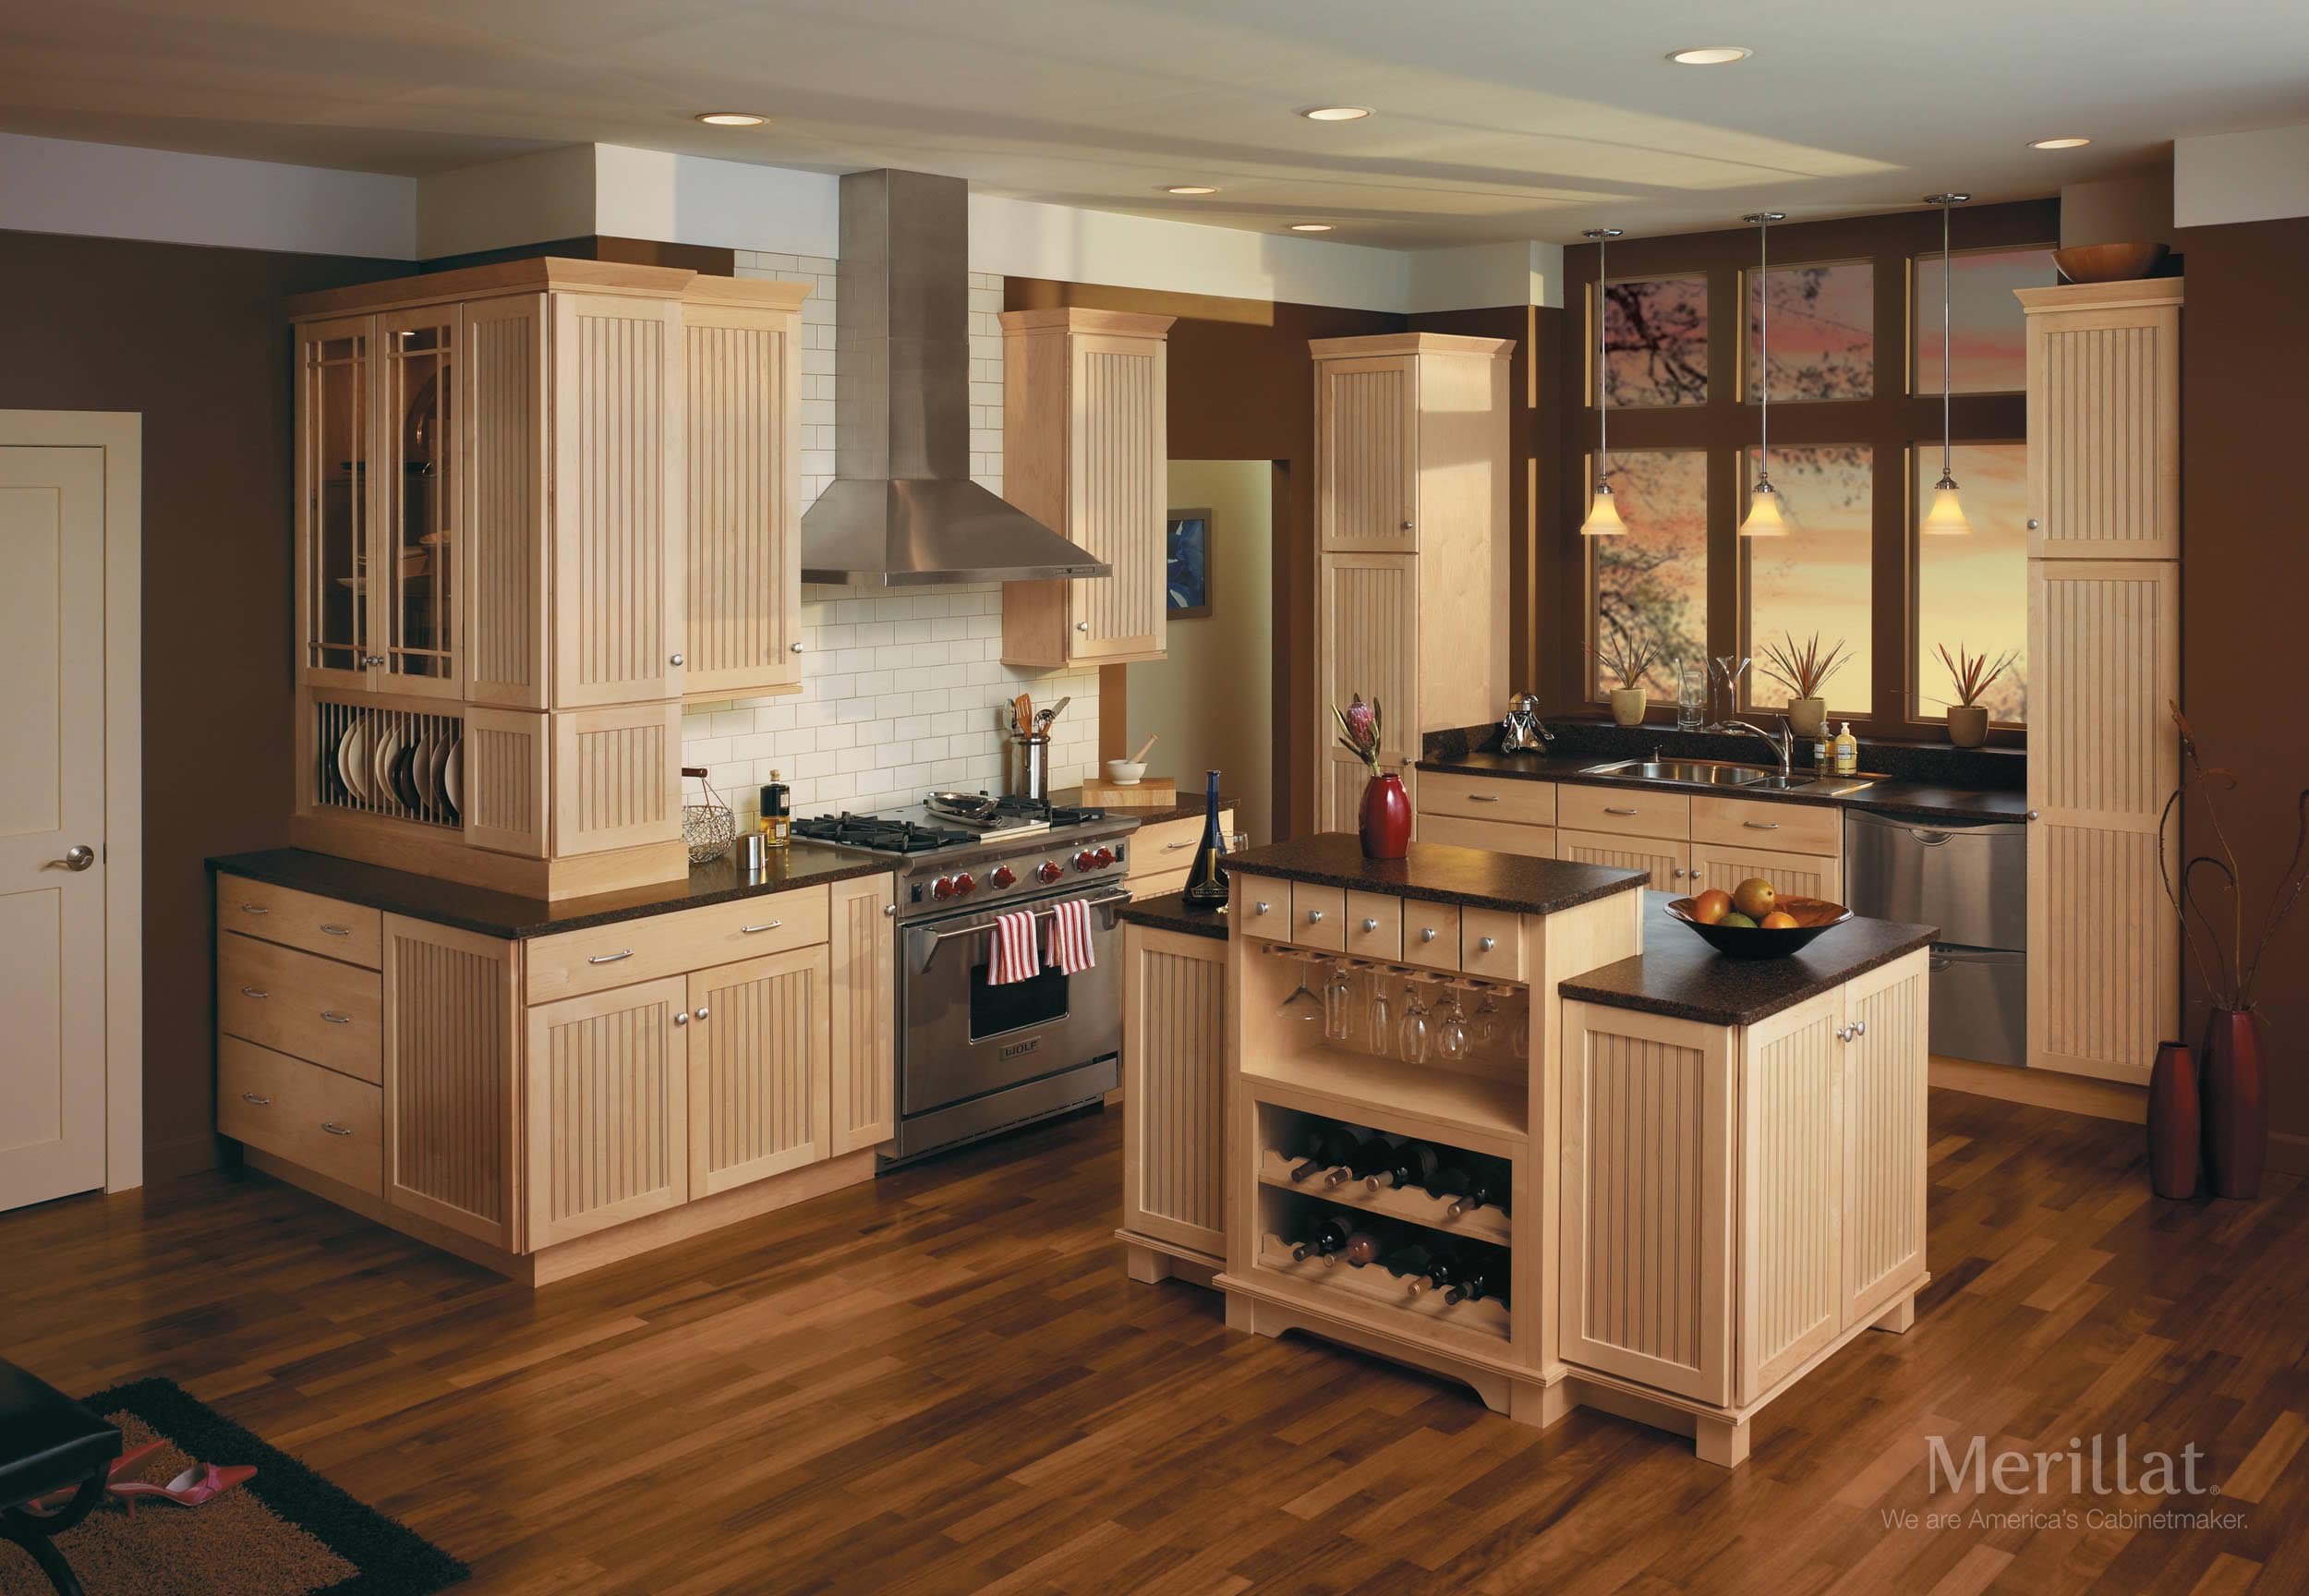 Merillat Kitchen Cabinet Doors Merillat Classicar Avenue In Maple Natural Merillat